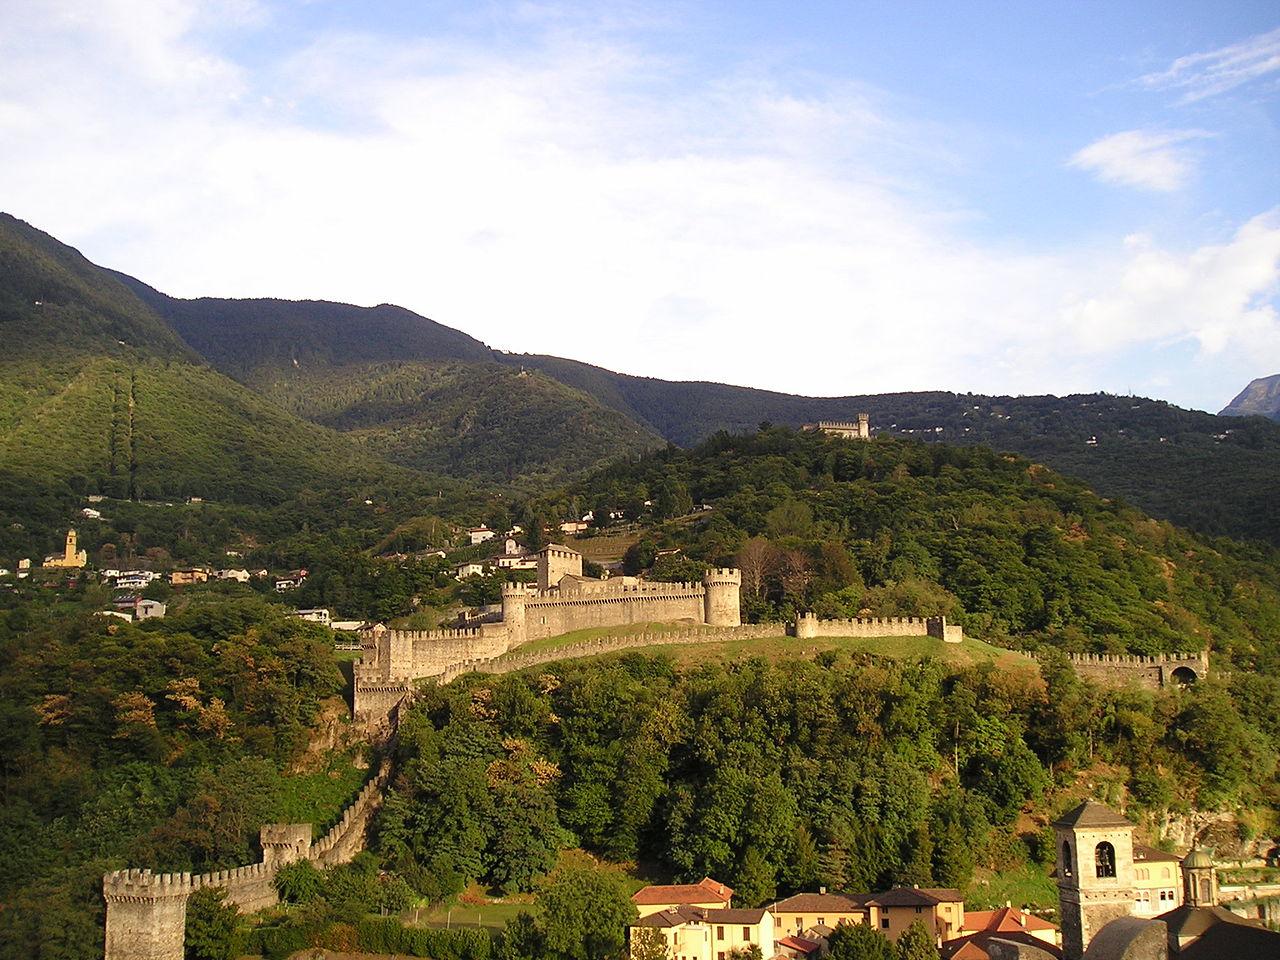 Замок Монтебелло, Швейцария